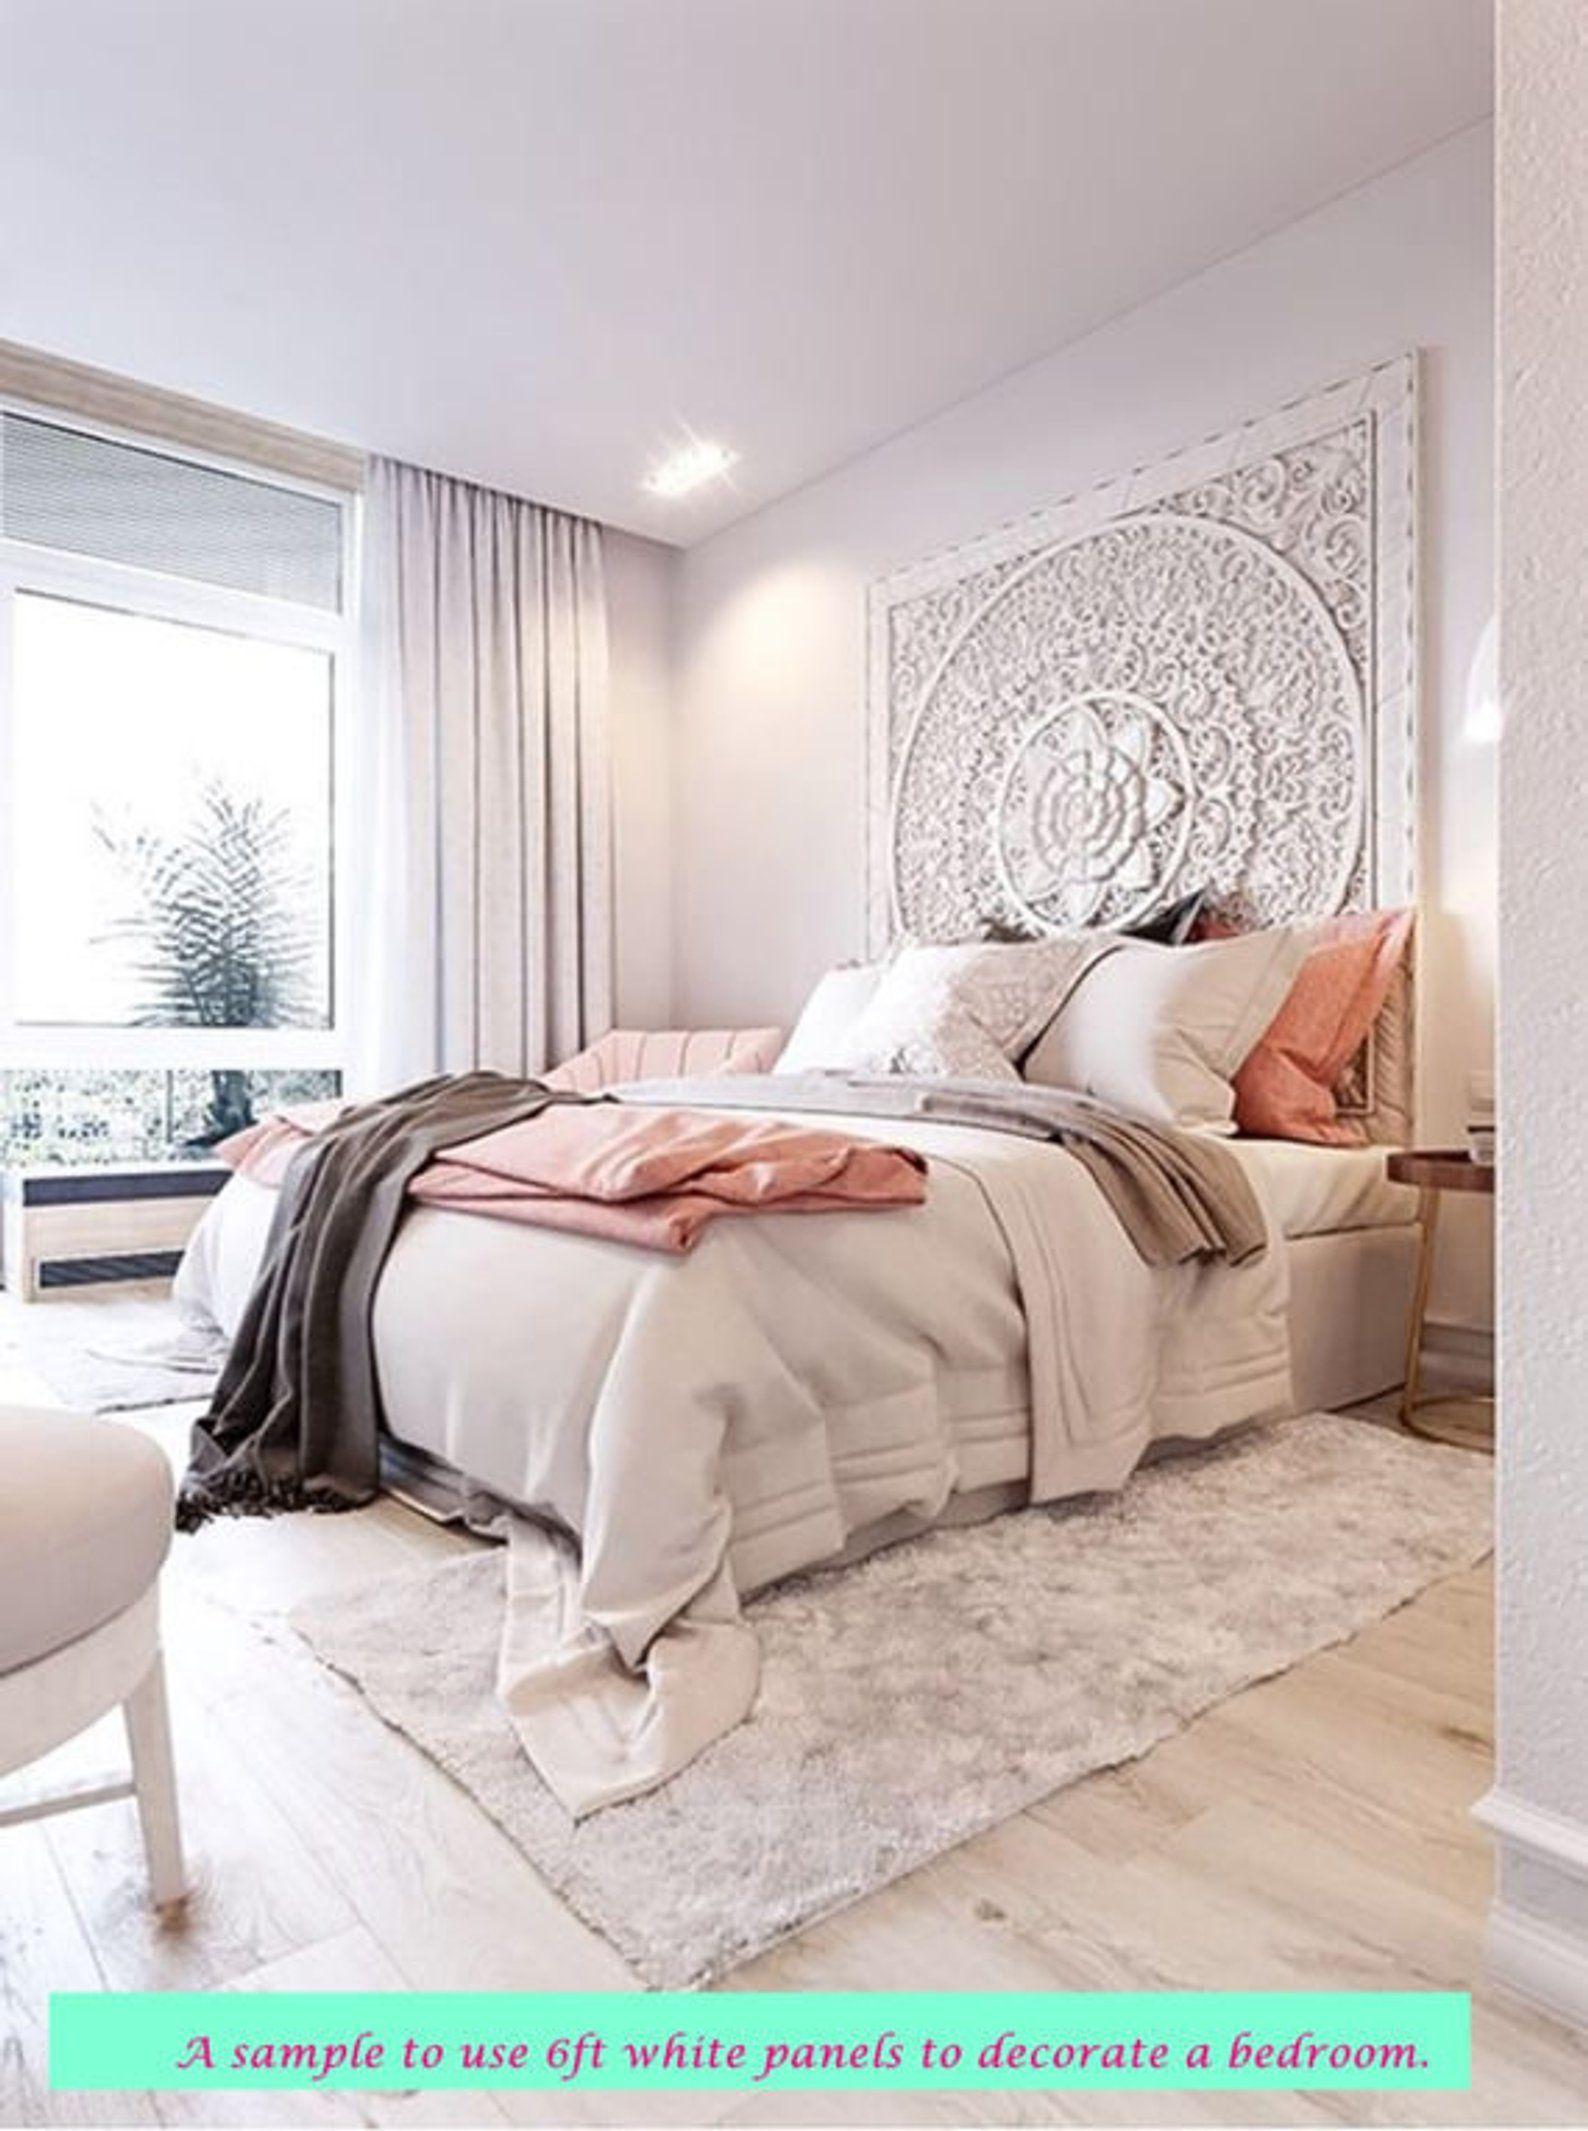 Large King Size Bed Headboard 71 Bohemian Lotus Mandala Wooden Hand Craved Craving Teak Wood Art Panel Panels White Wall Home Decor Thai Bedroom Design Bedroom Inspirations Bedroom Makeover